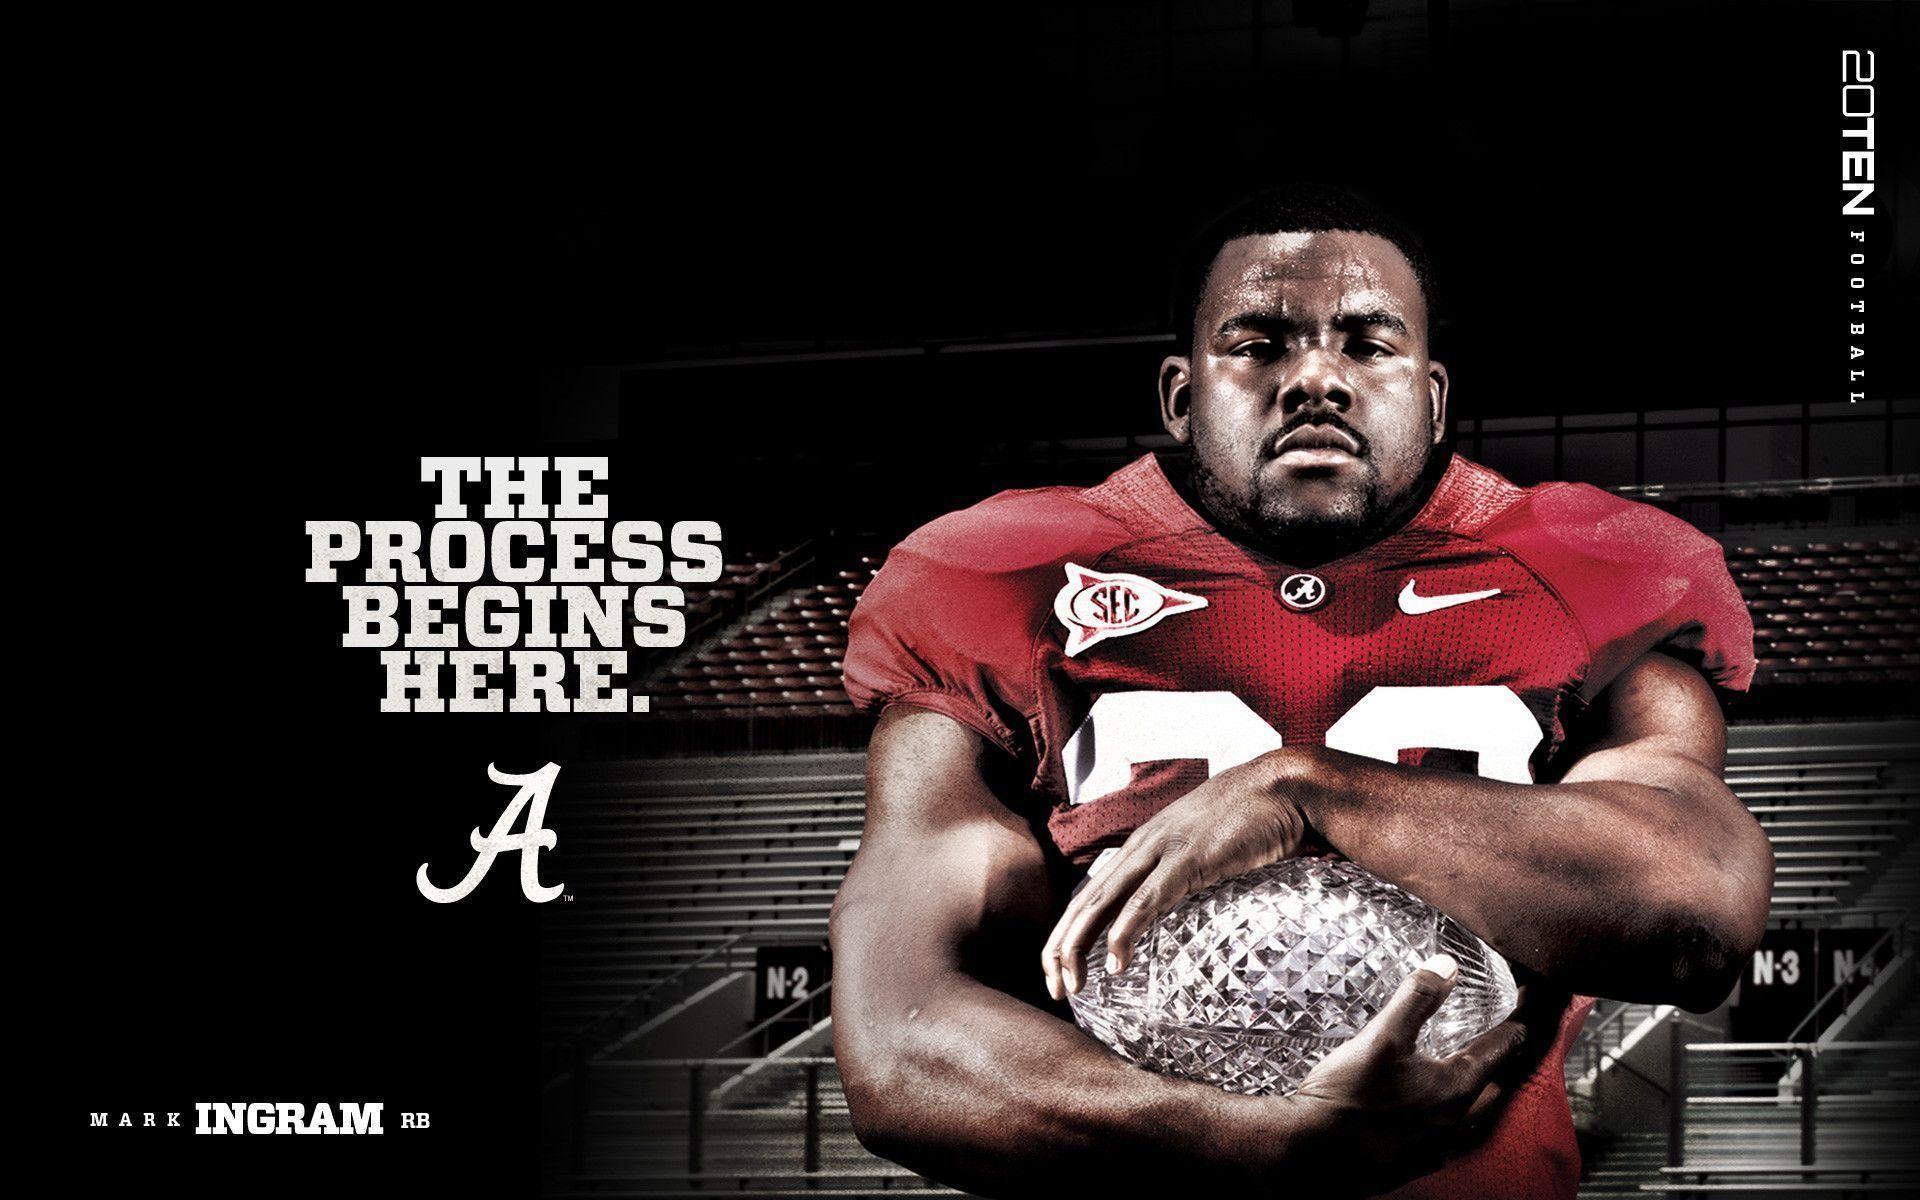 Alabama-Football-Wallpapers-Free-Alabama-Football-Wallpaper-HD .